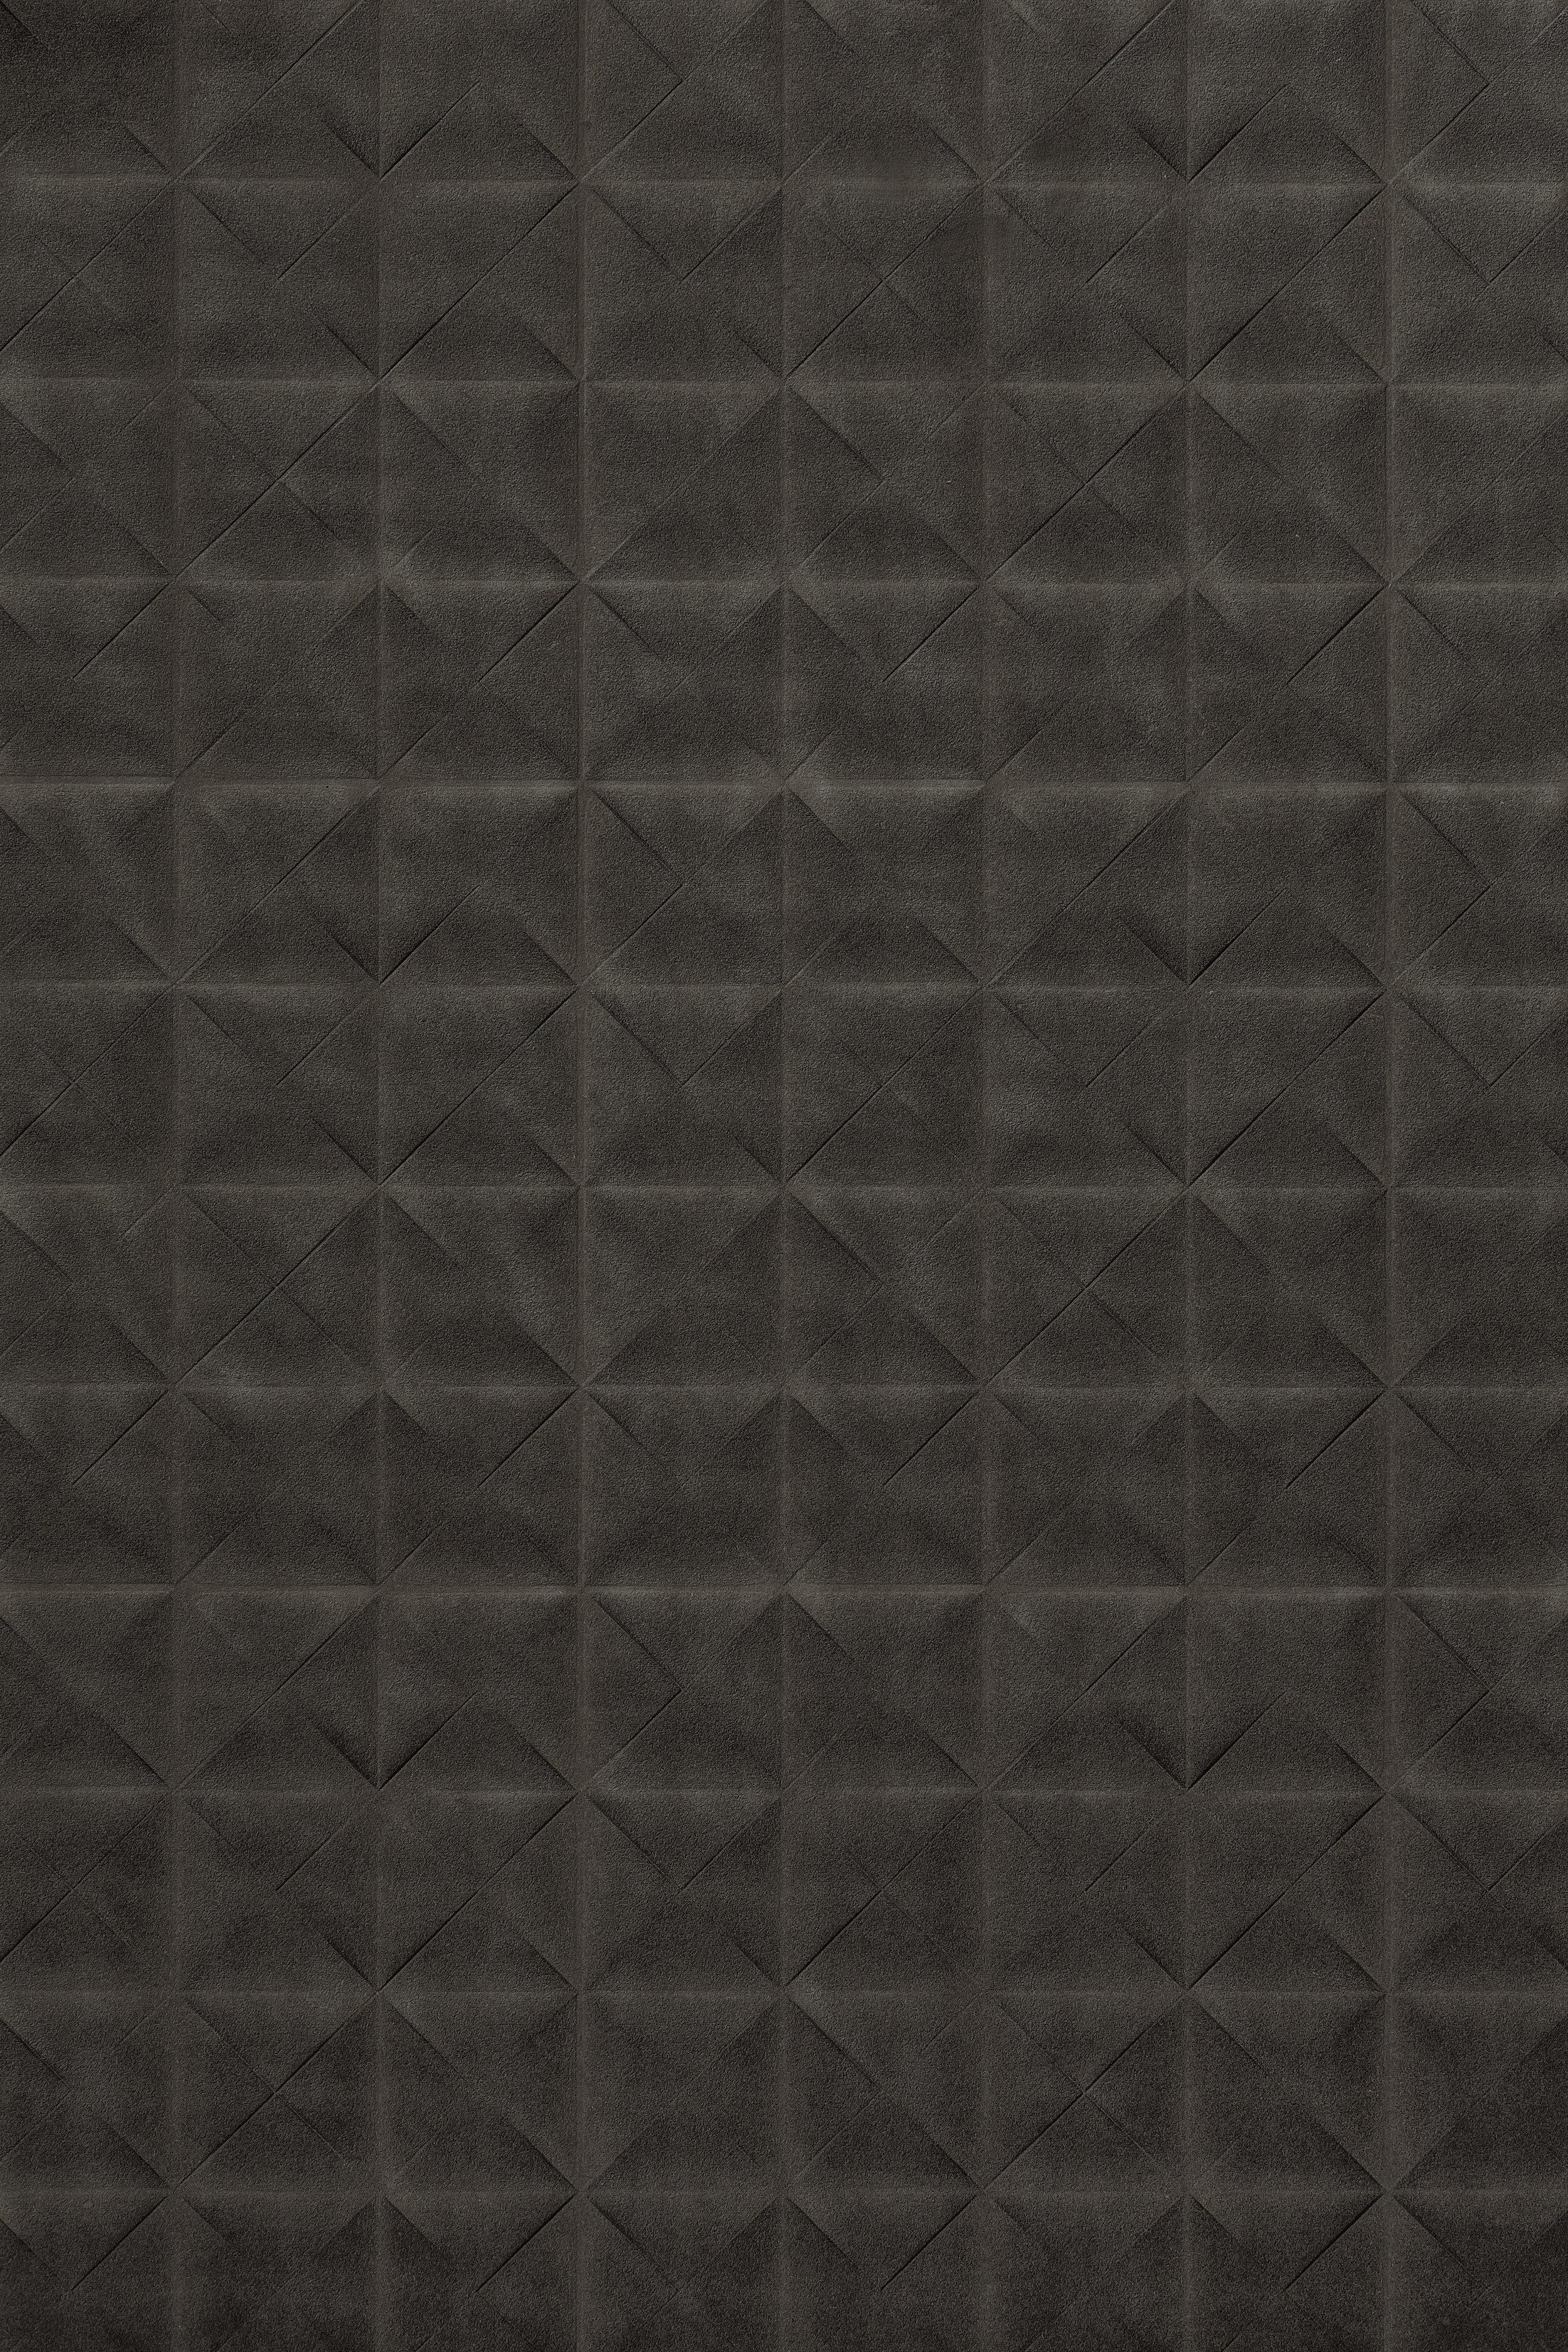 3_origamia_Mia Kepenek_mdf black.jpg